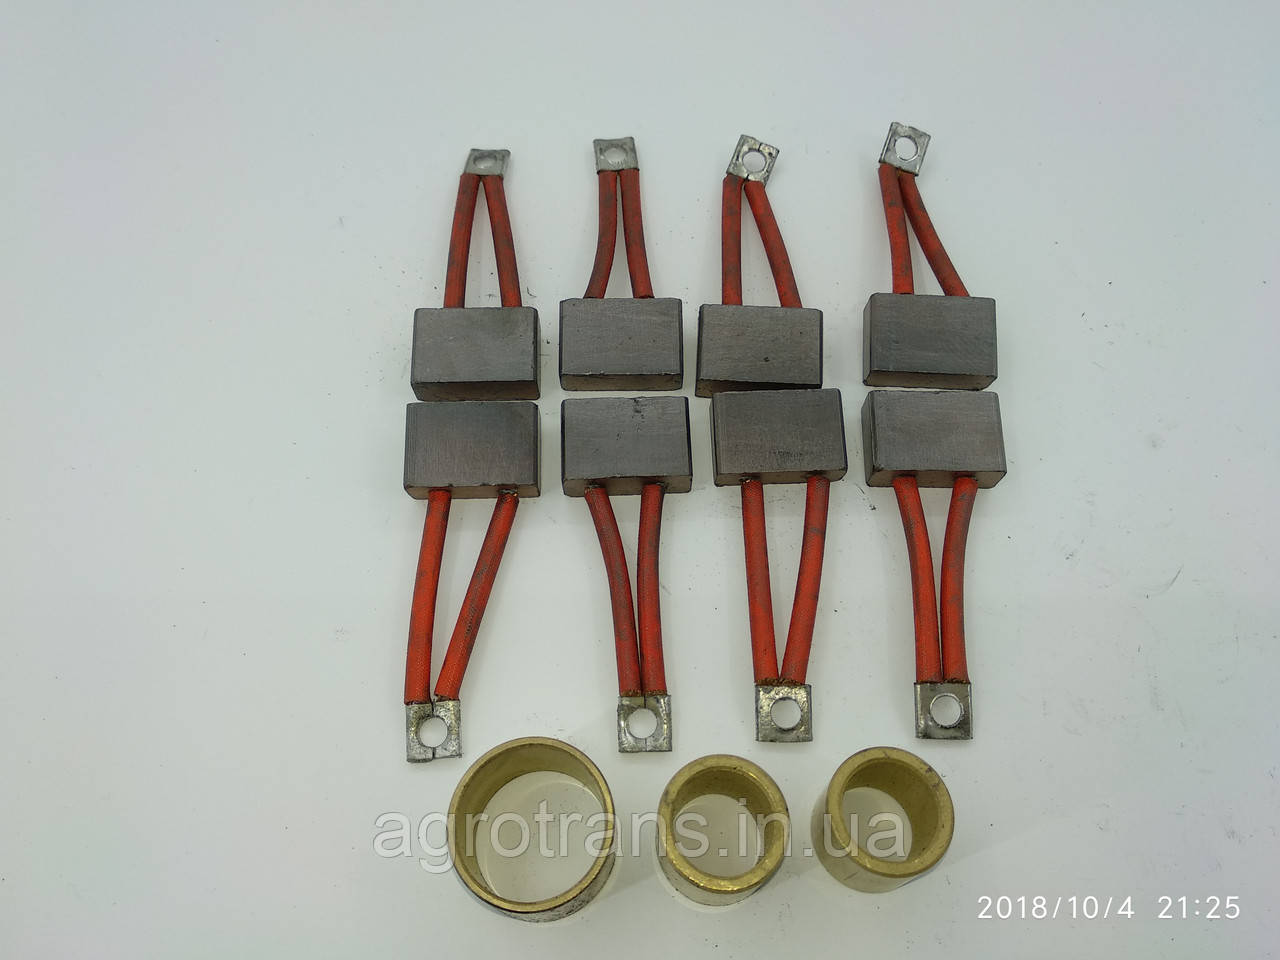 Ремкомплект стартера МАЗ СТ-25 (3 втулки, 8 щеток) СТ25-3708020 (ЯМЗ, Дон, Т-170, К702)